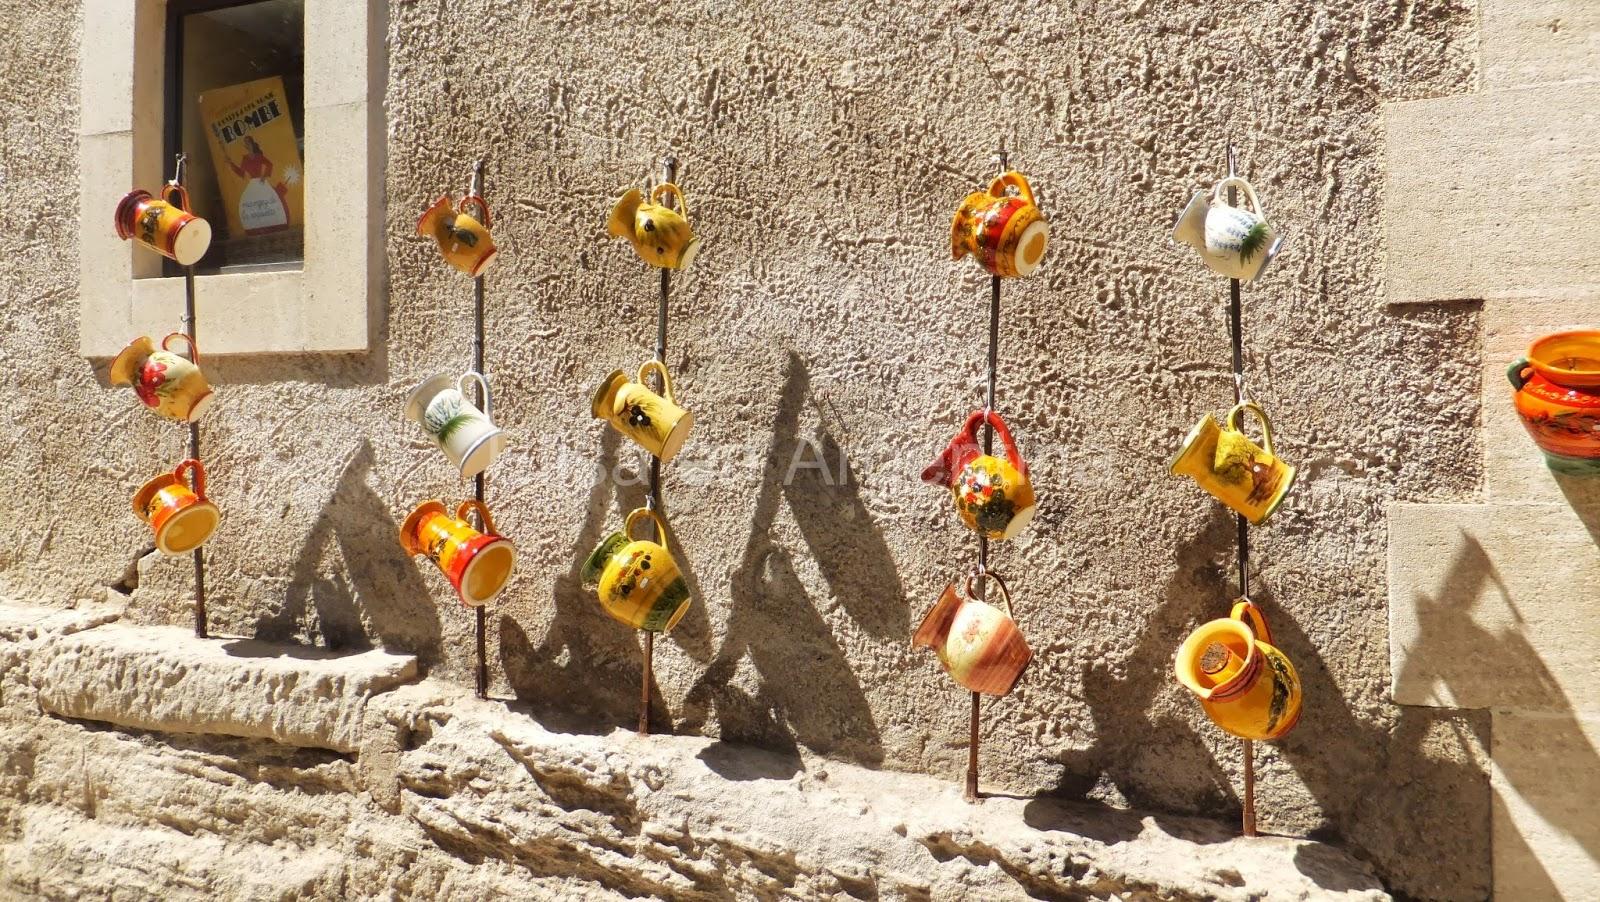 Ciudades Bellas de Francia, Les Baux-de-Provence, Elisa N, Blog de Viajes, Lifestyle, Travel